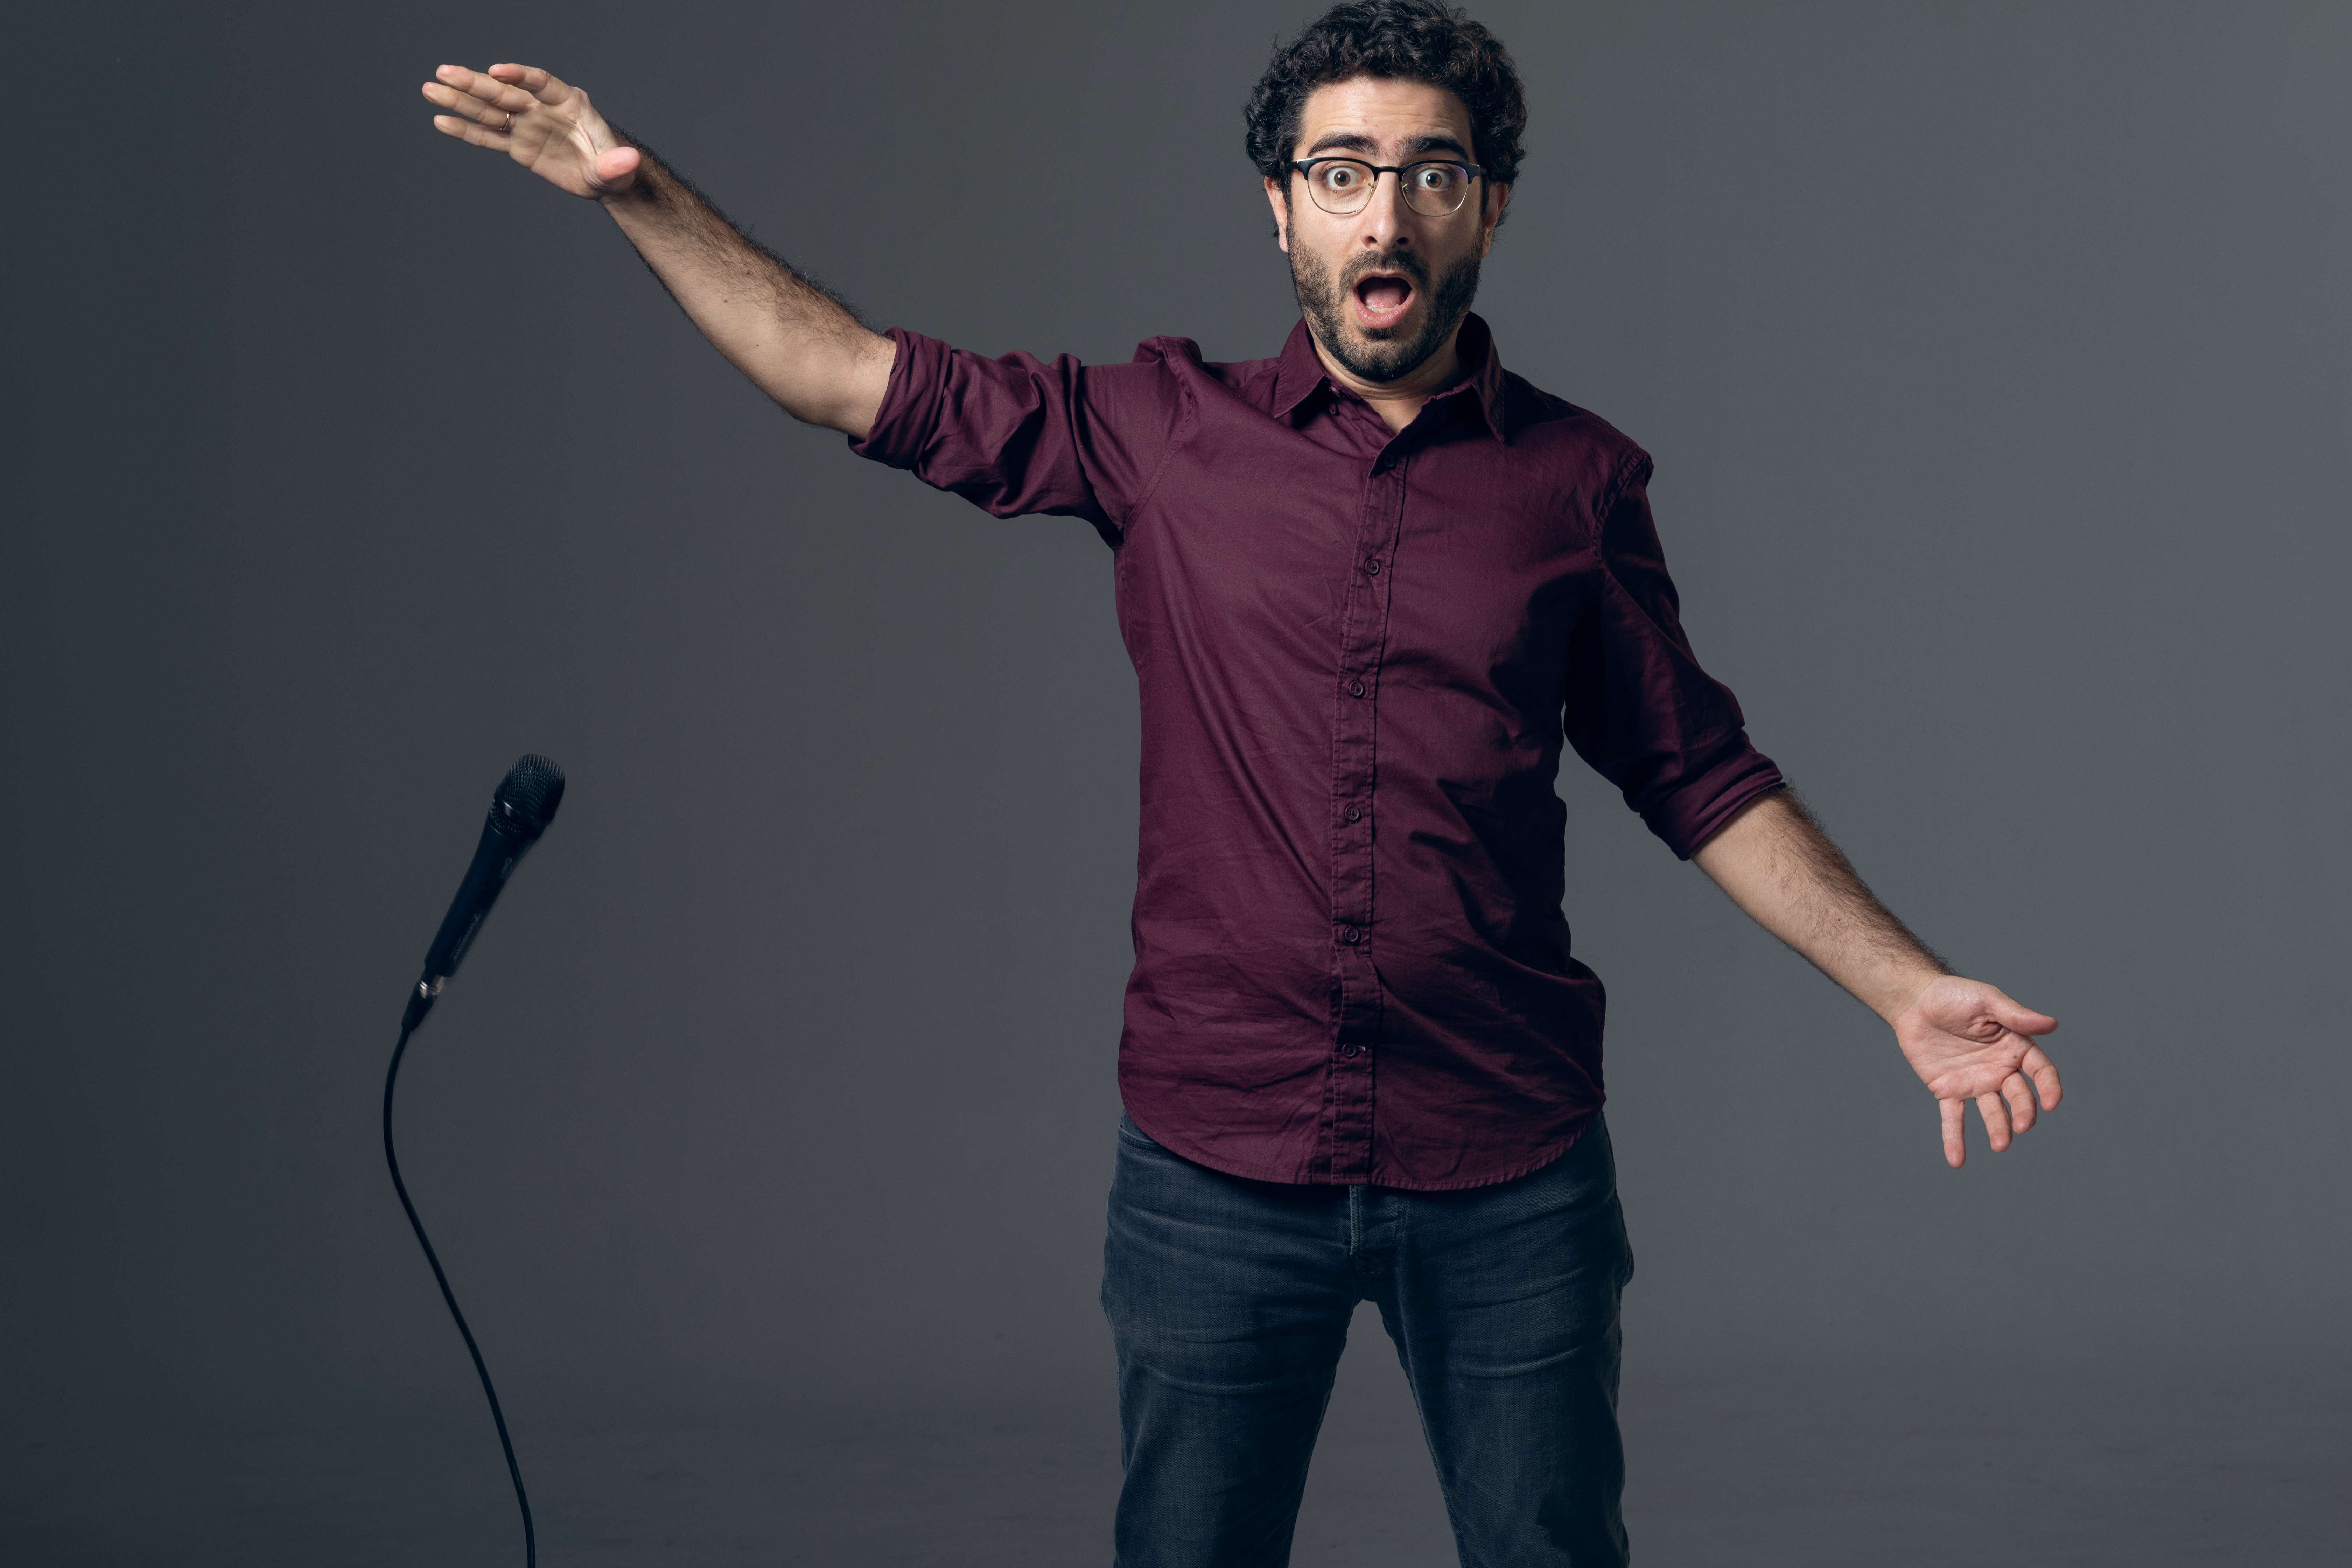 O Λάμπρος Φισφής έρχεται με ένα ξεκαρδιστικό stand-up comedy show